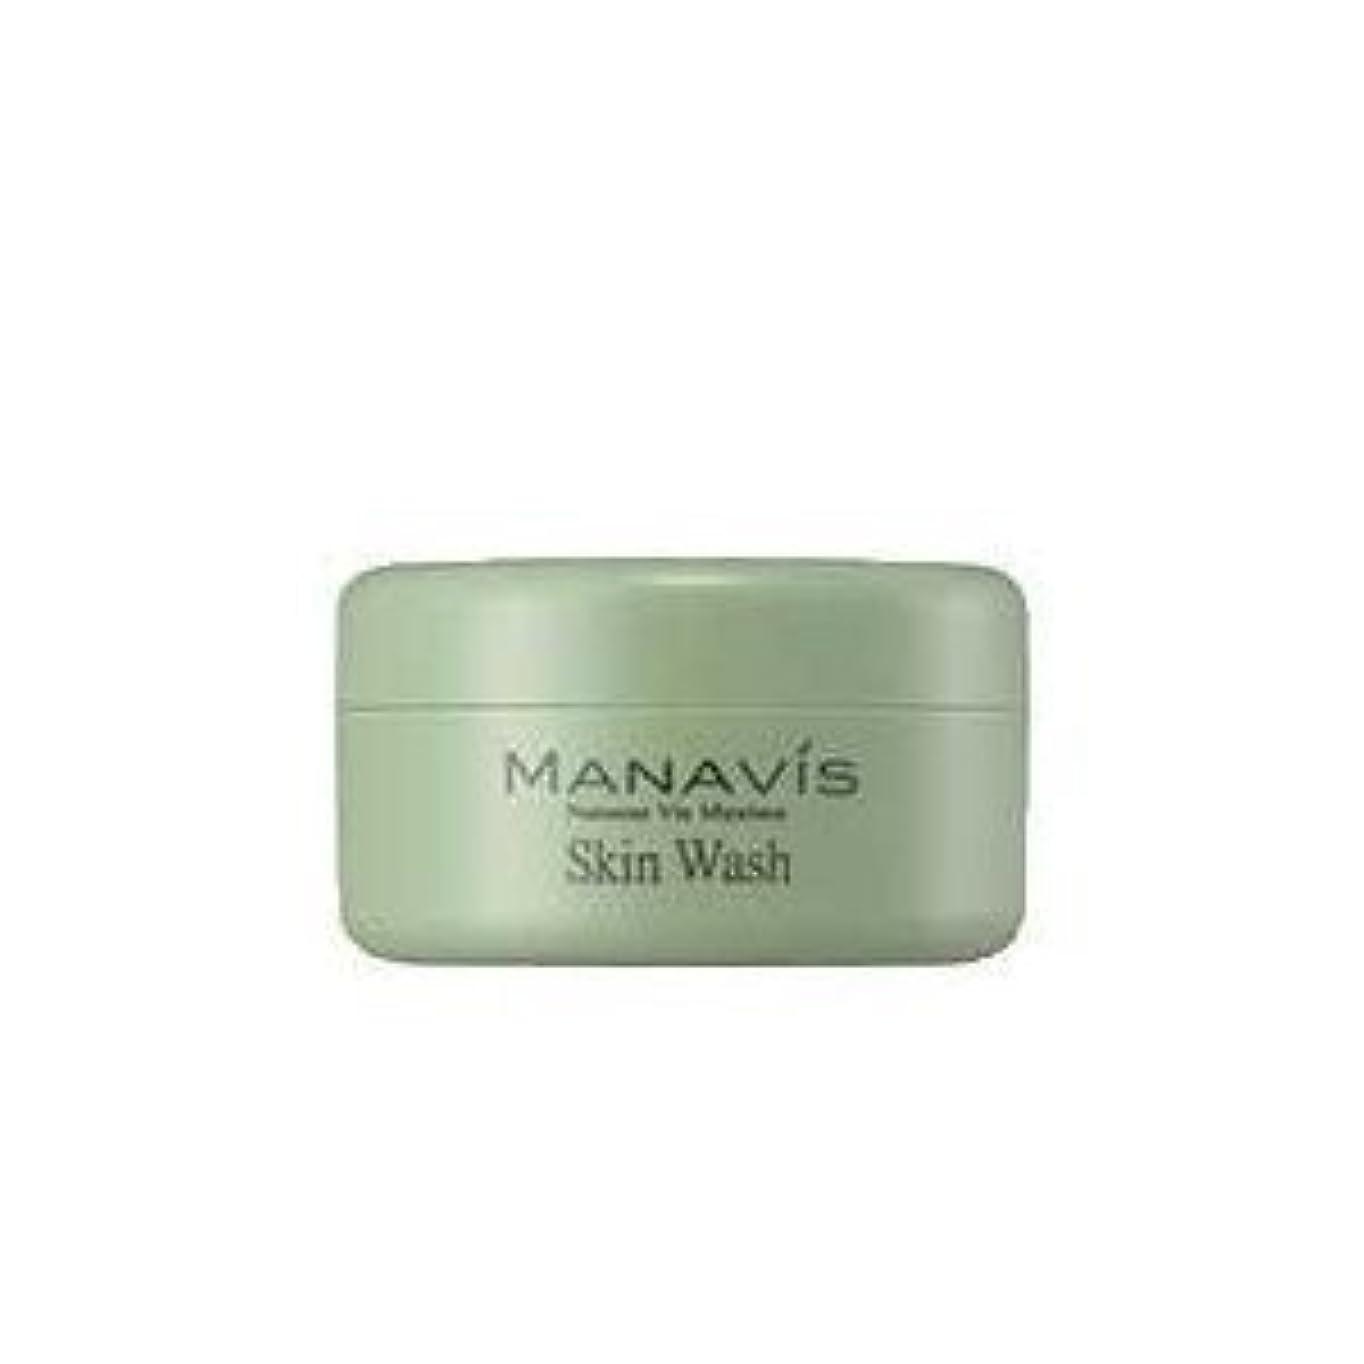 MANAVIS マナビス化粧品 薬用スキンウォッシュ d